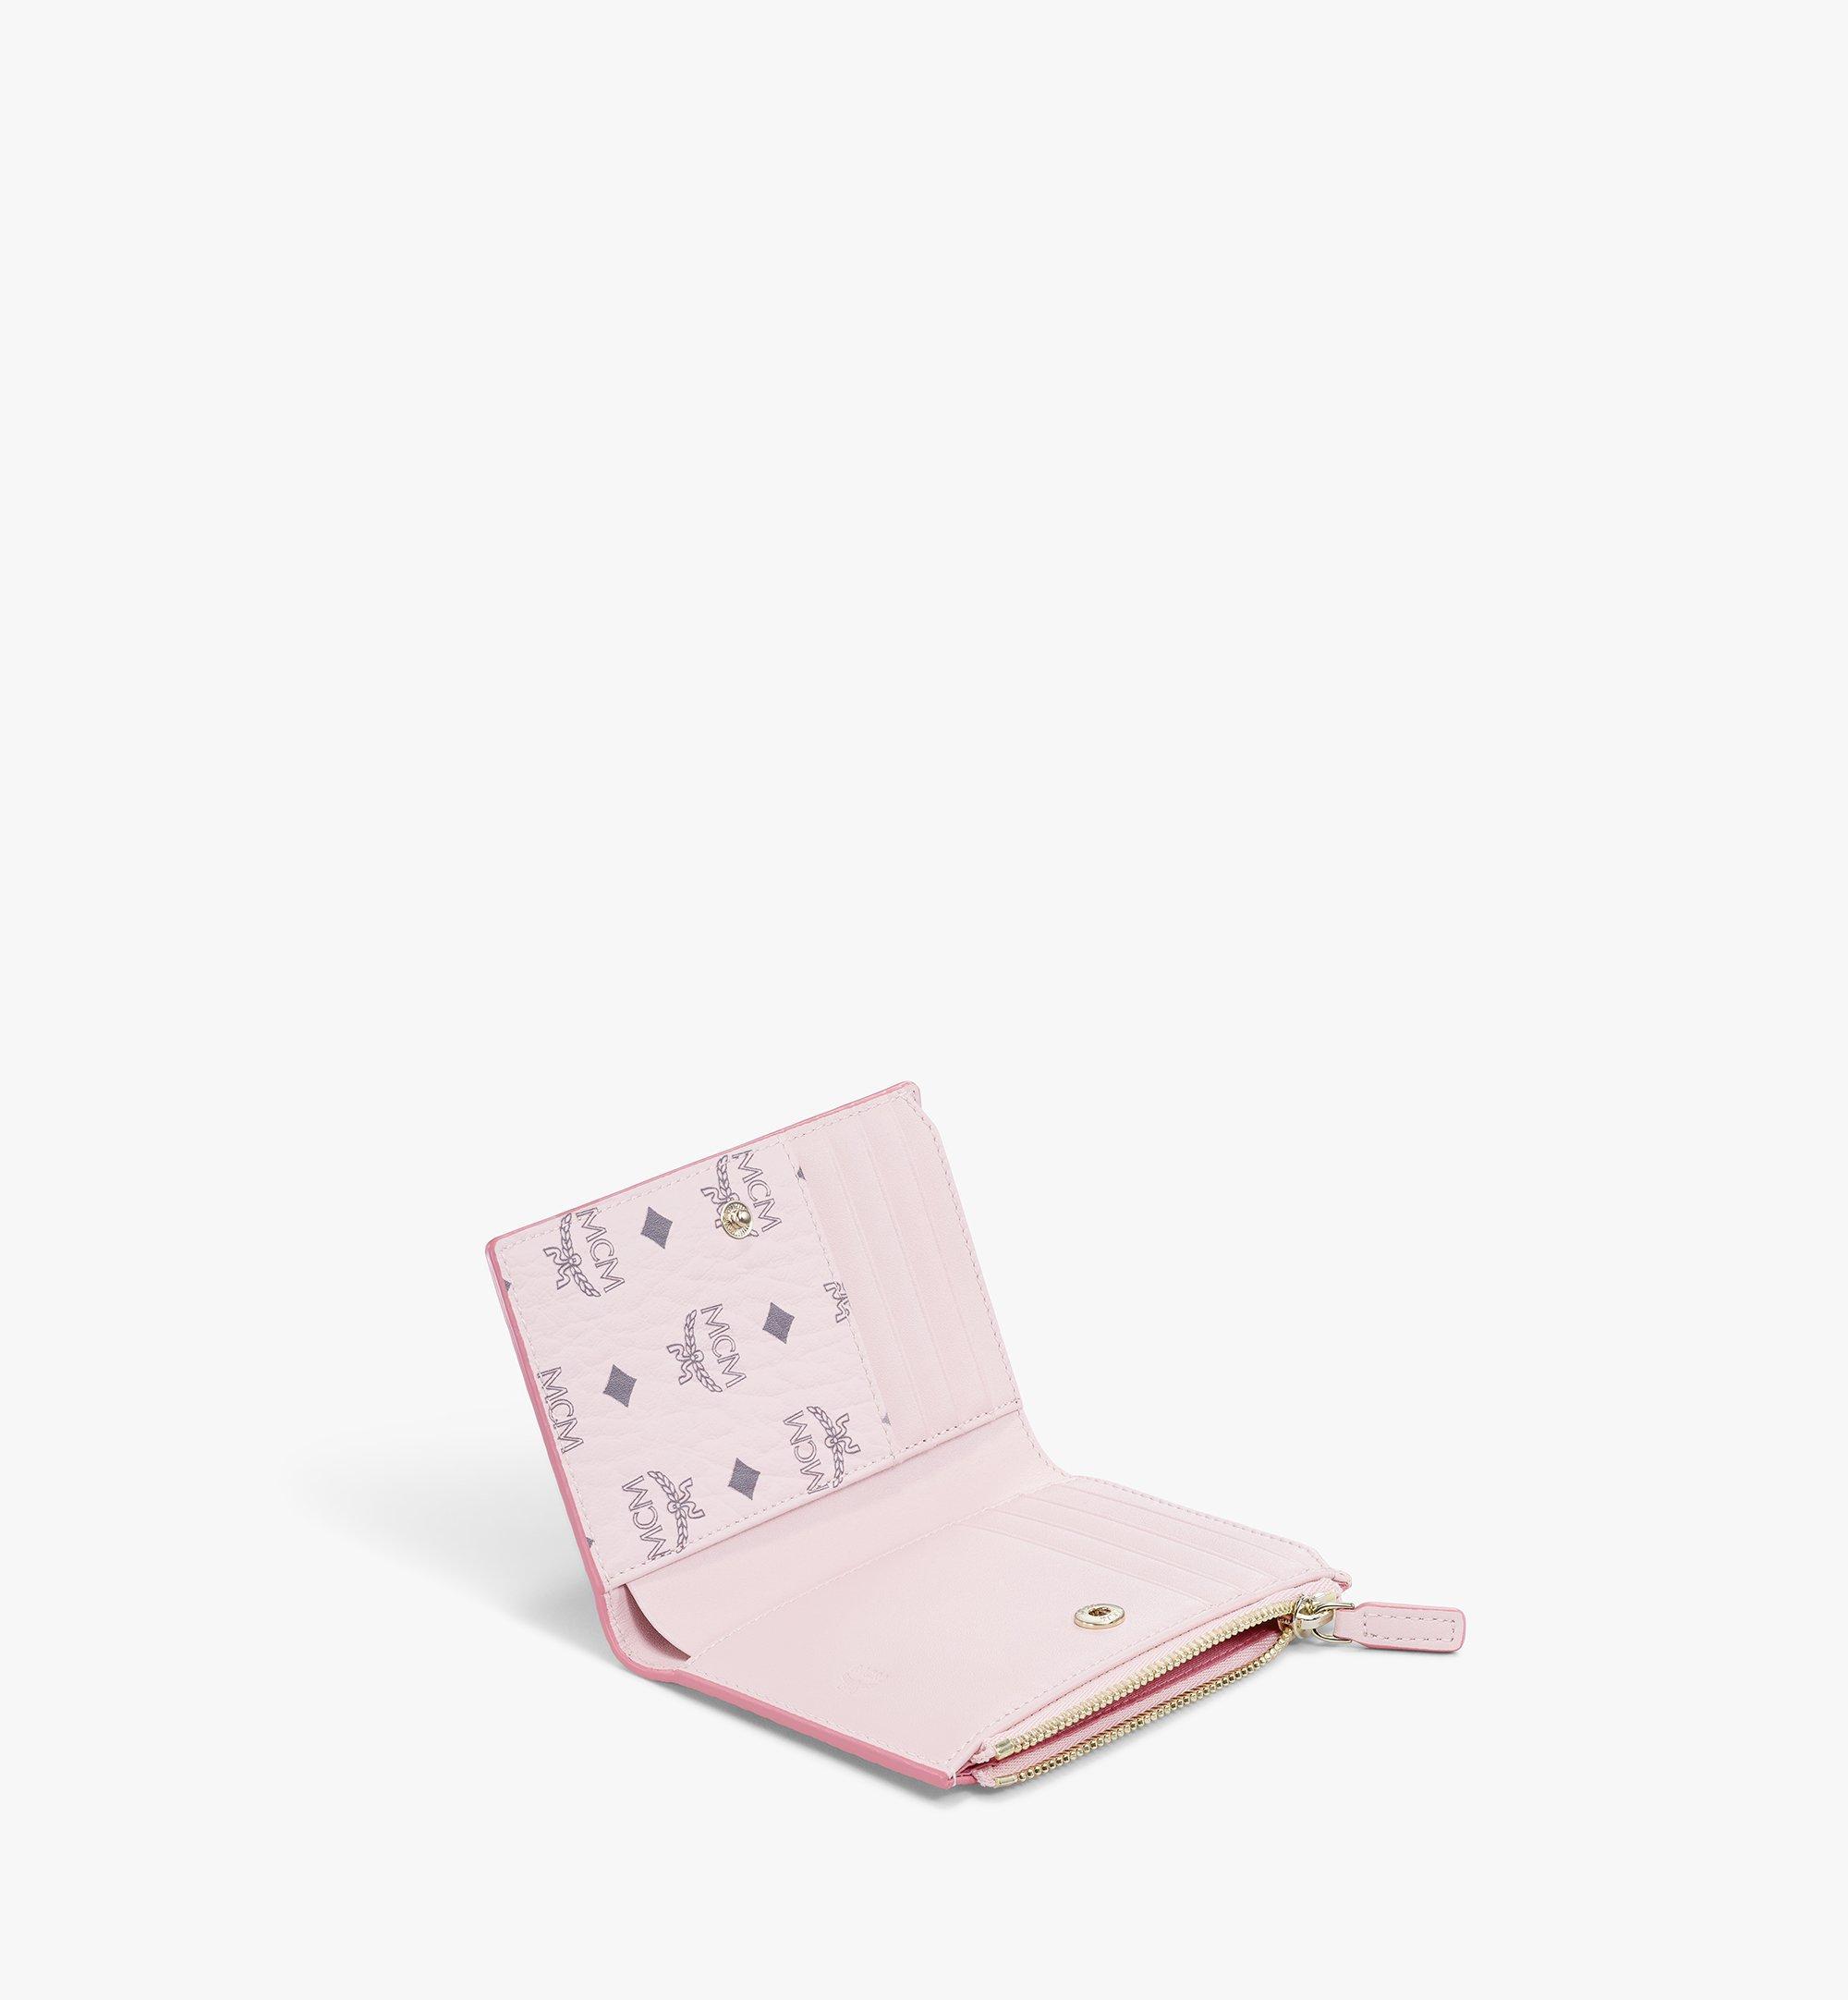 MCM Visetos Original 系列雙折拉鏈卡夾錢包 Pink MXSBSVI01QH001 更多視圖 1